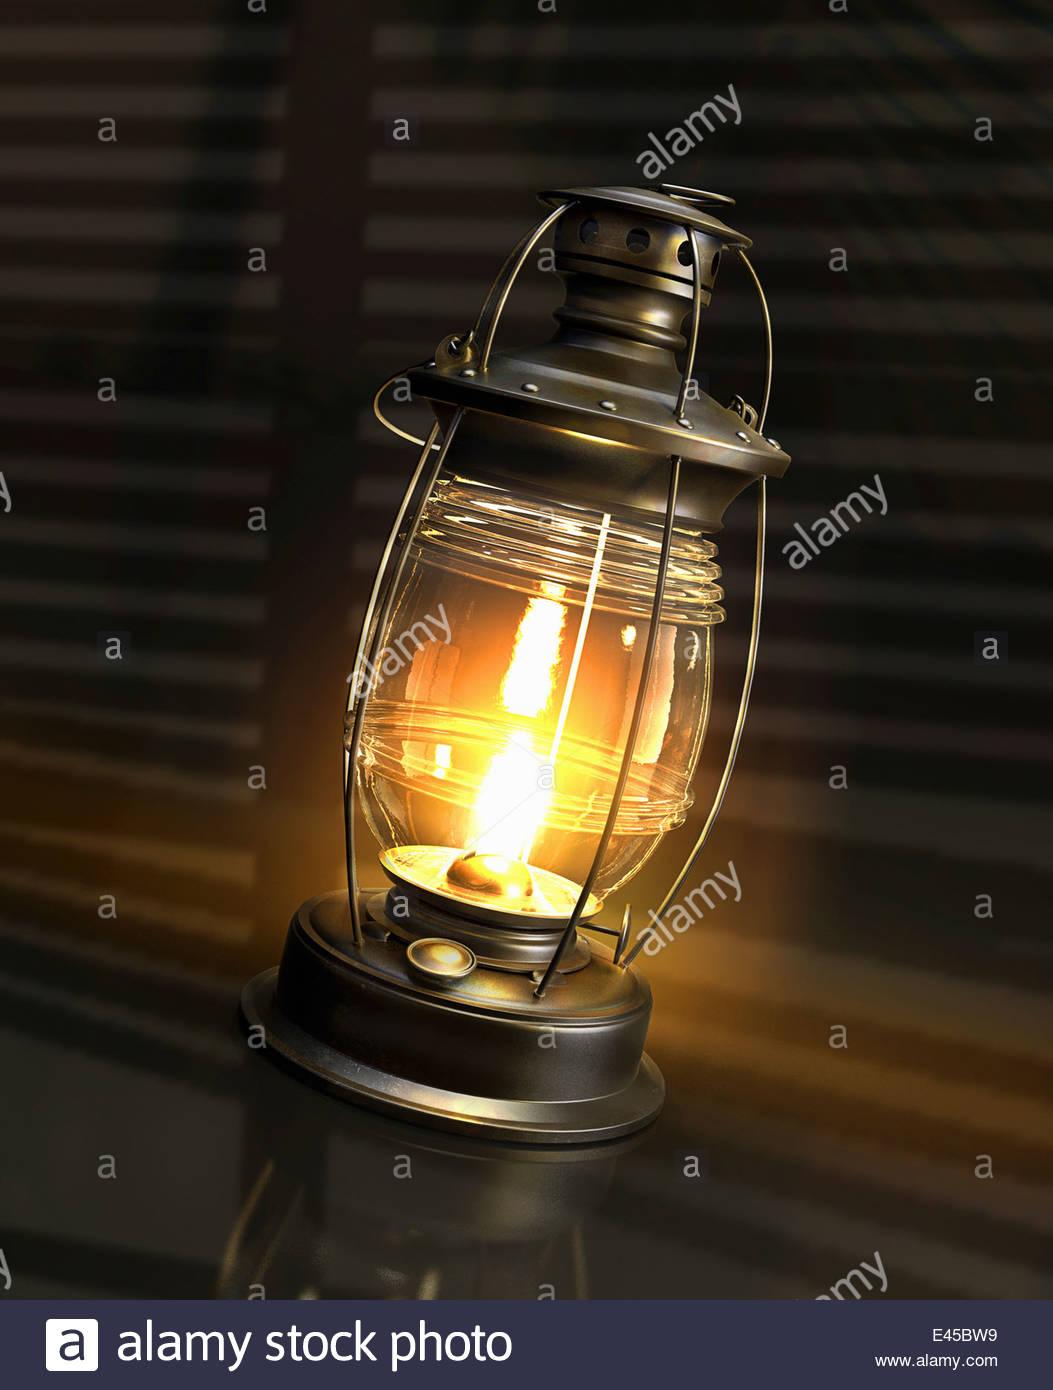 Illuminata incandescente lampada di paraffina Immagini Stock